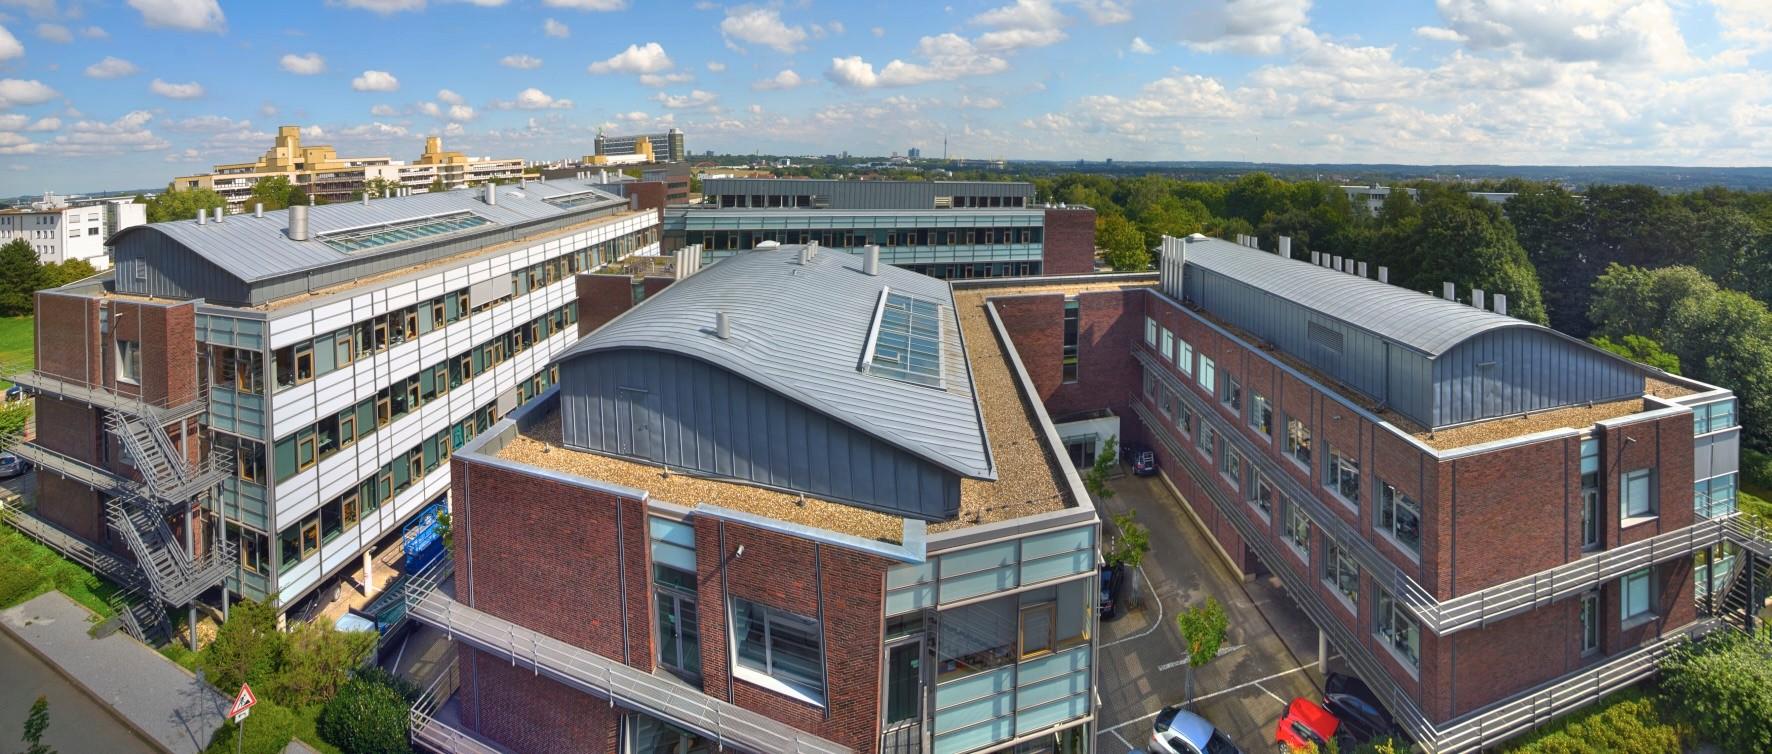 Max Planck Institute of Molecular Physiology | LinkedIn